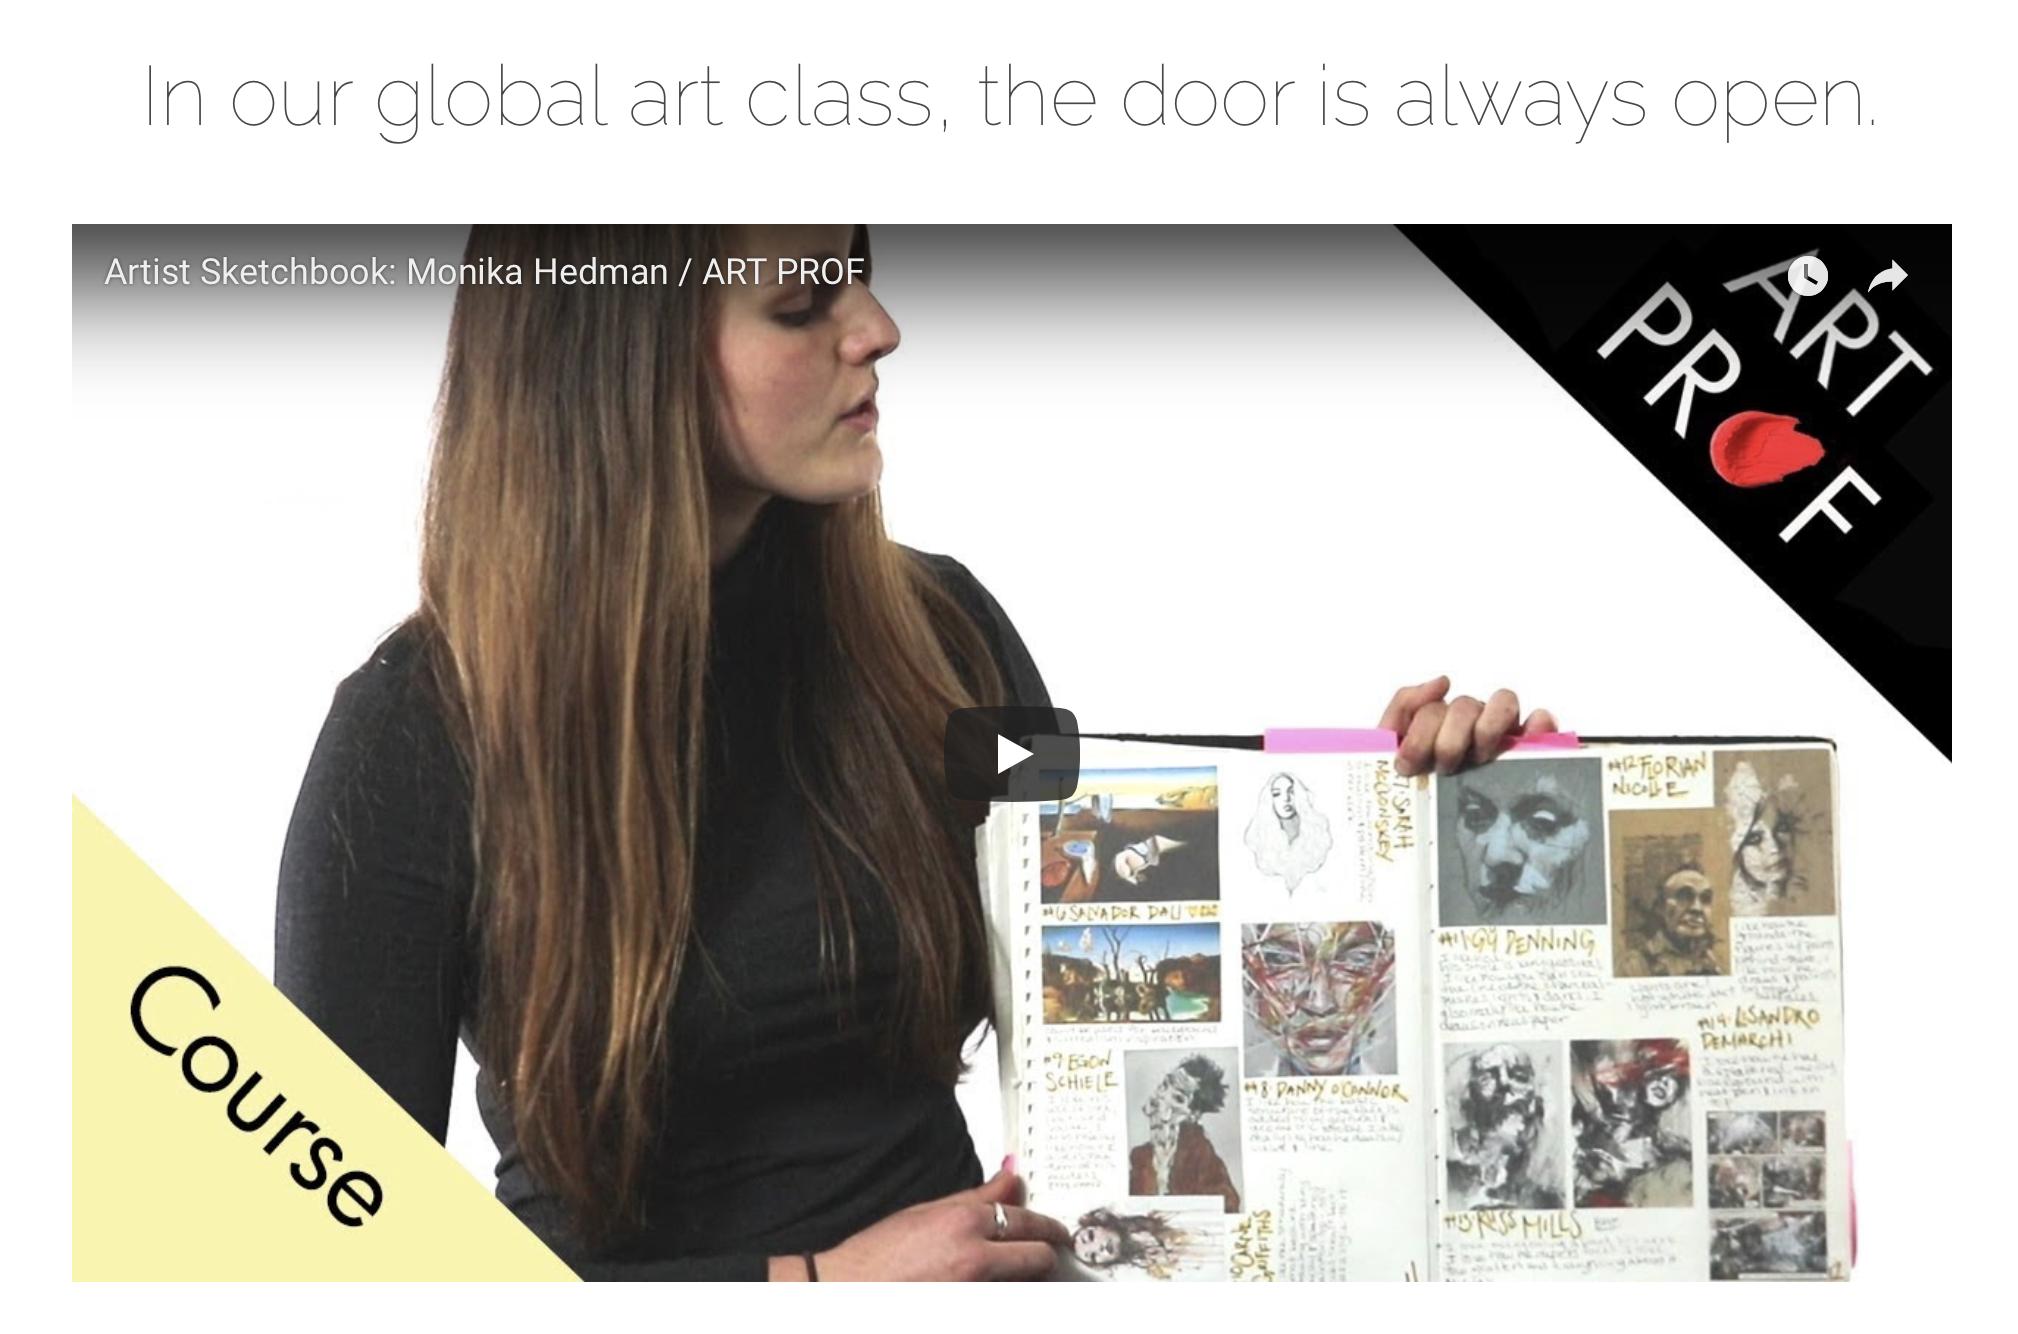 art prof: artist sketchbook video